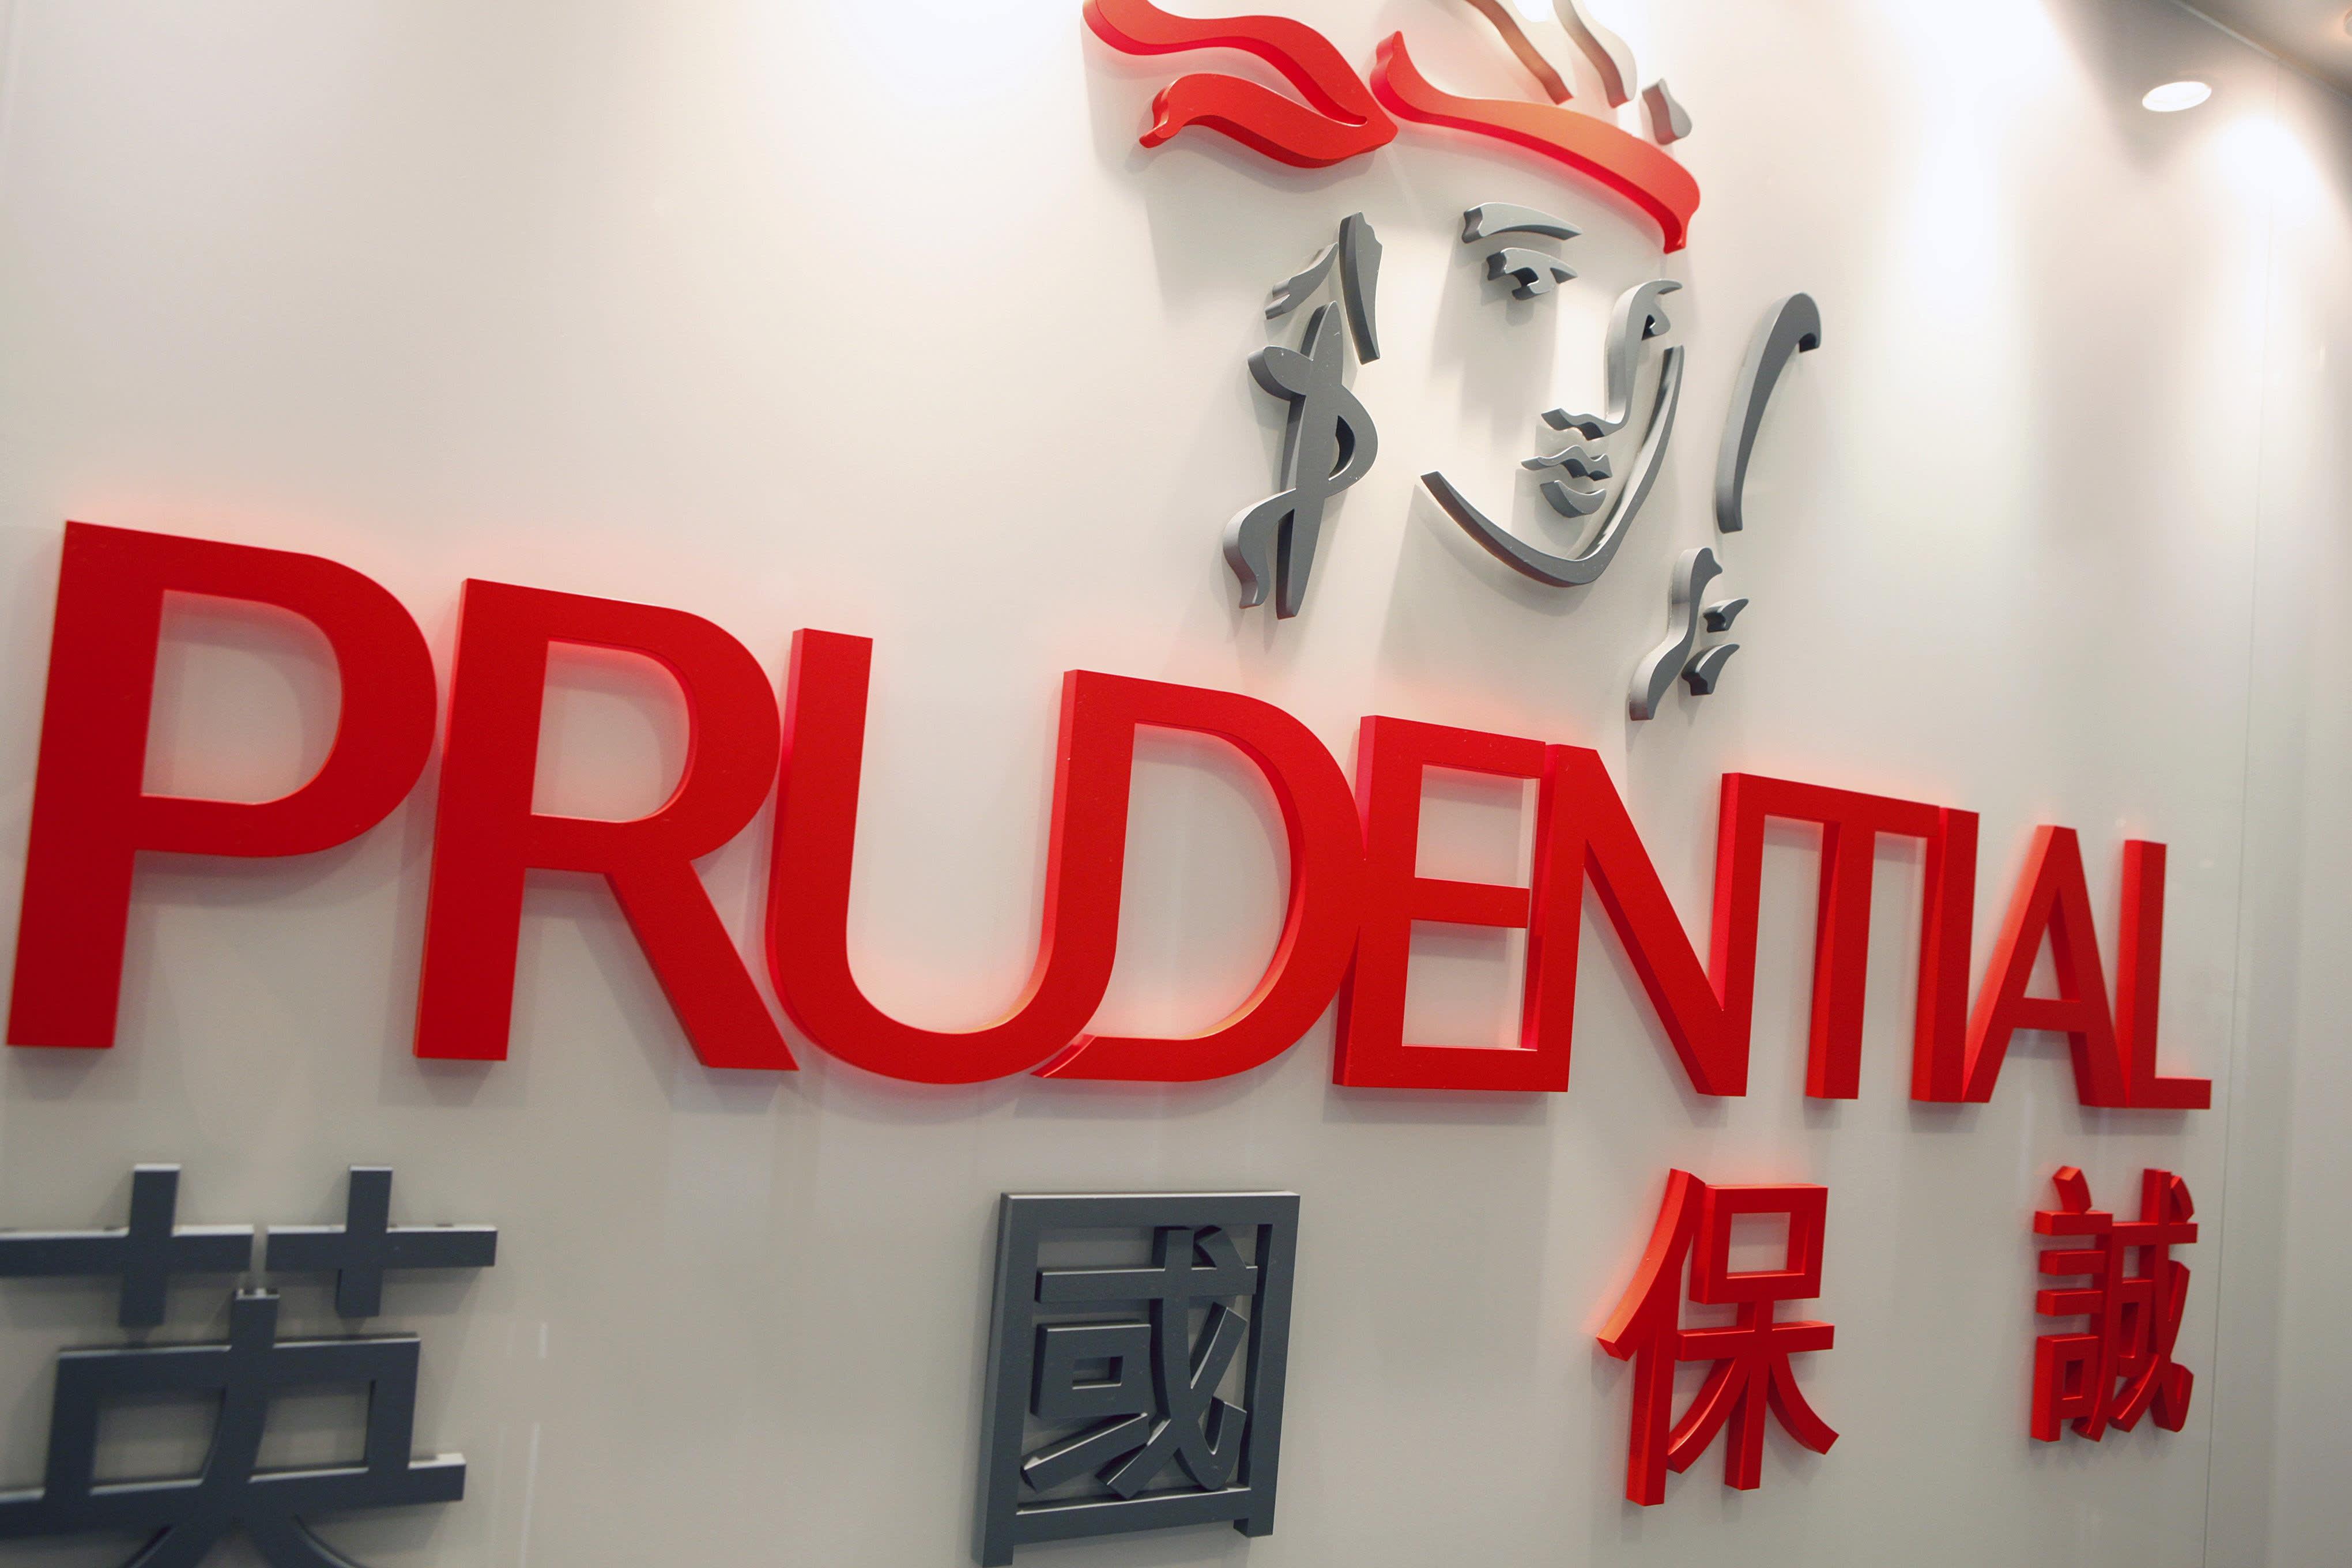 Prudential criticised for pension adminerror